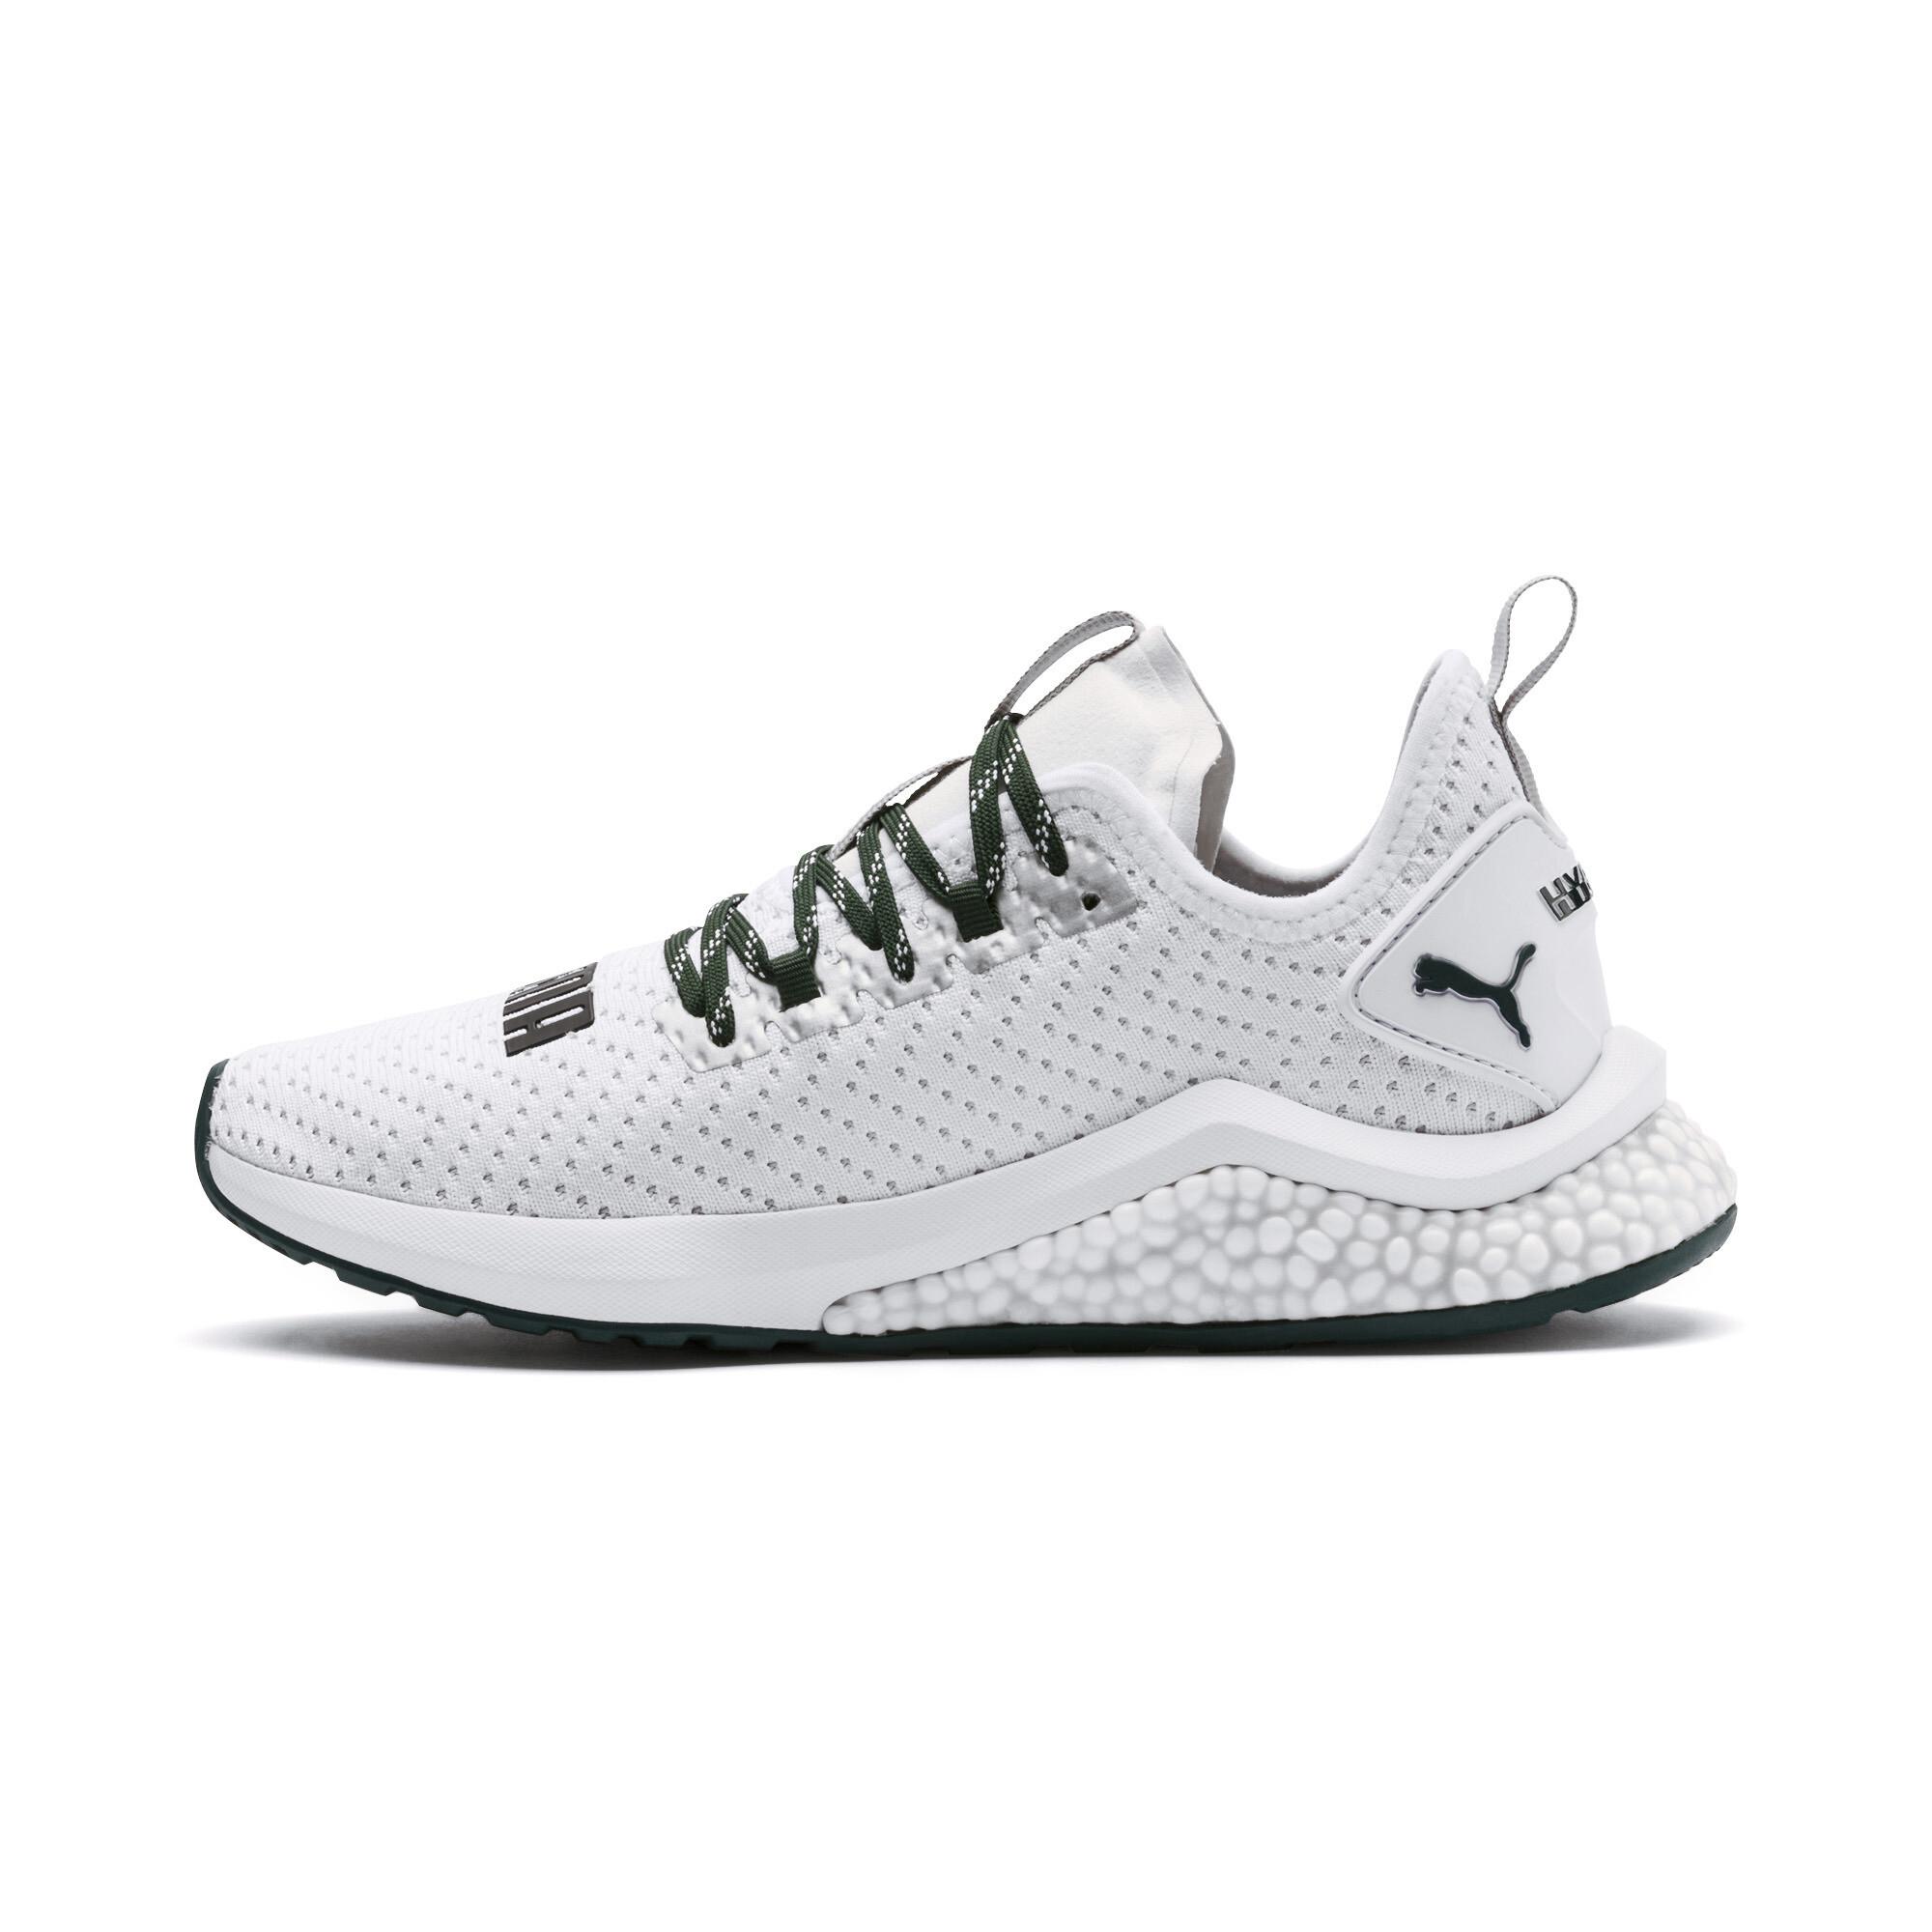 Details zu PUMA HYBRID NX TZ Damen Laufschuhe Frauen Schuhe Laufen Neu